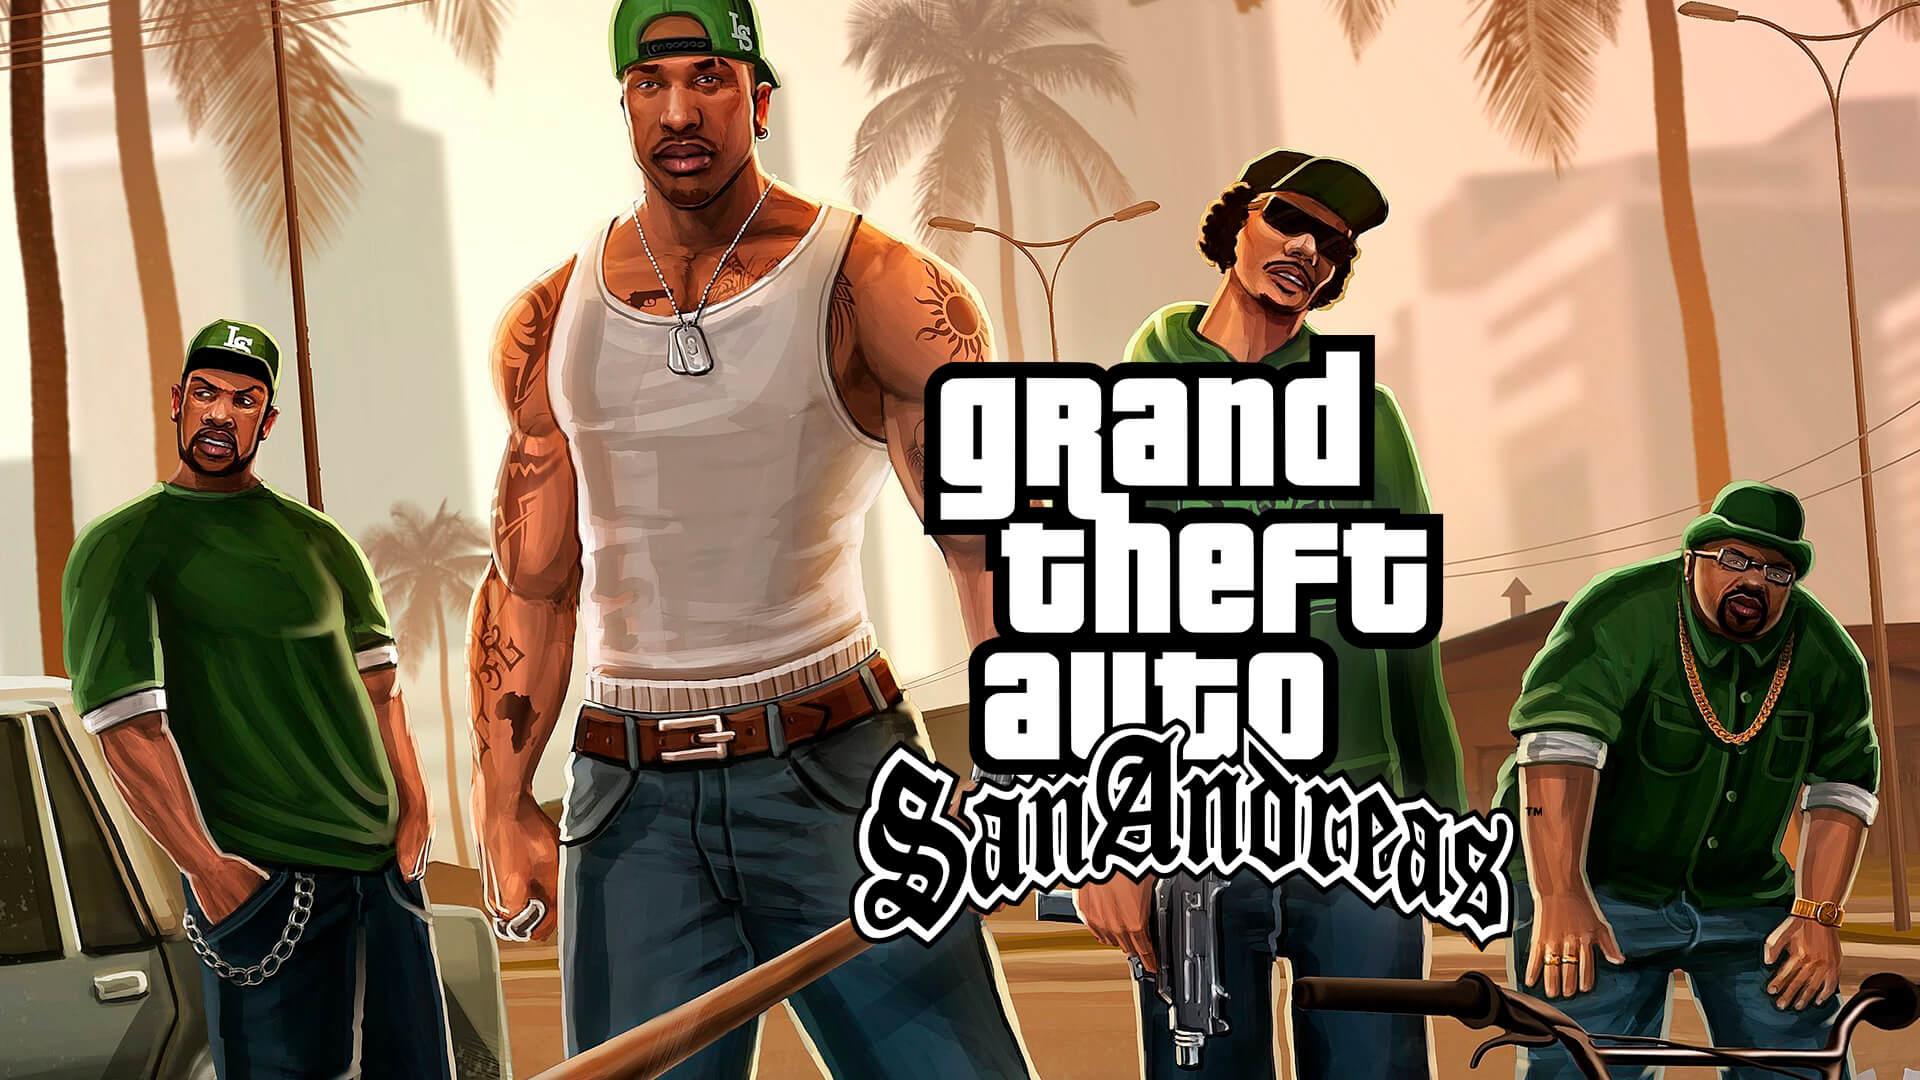 GTA San Andreas | Como era o jogo antes do lançamento? Confira! 1